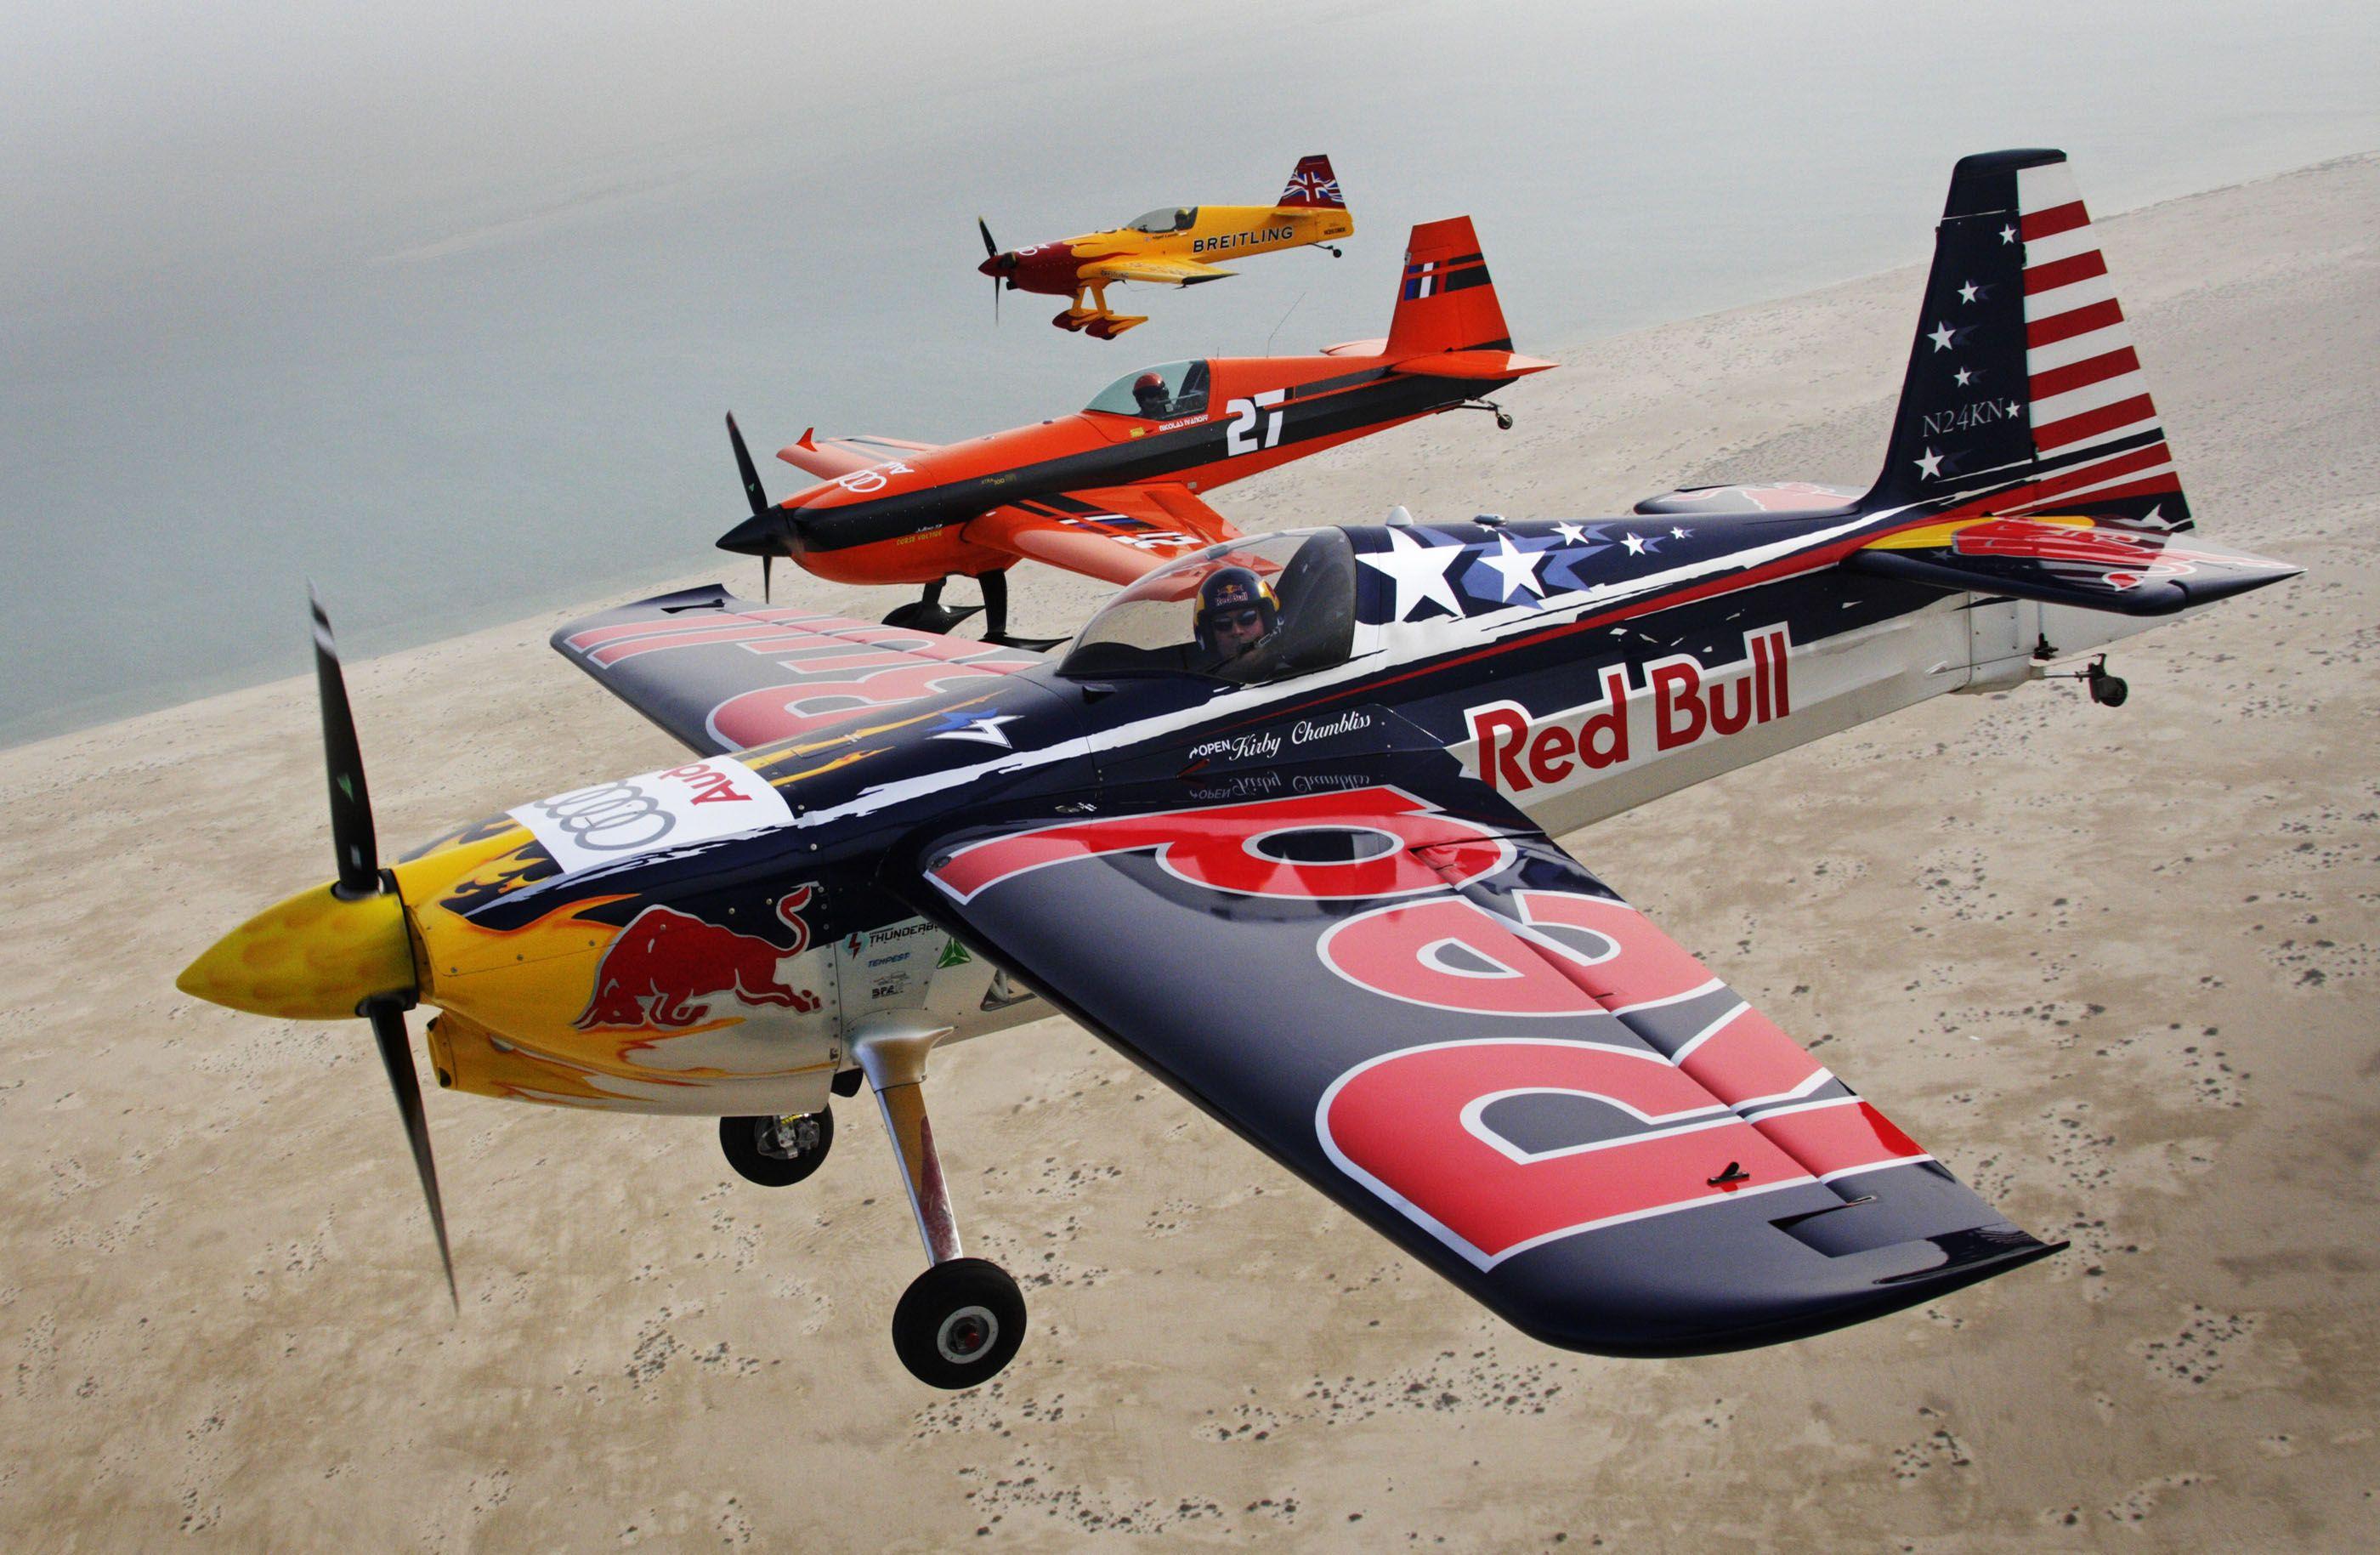 REDBULLAIRRACE airplane plane race racing red bull